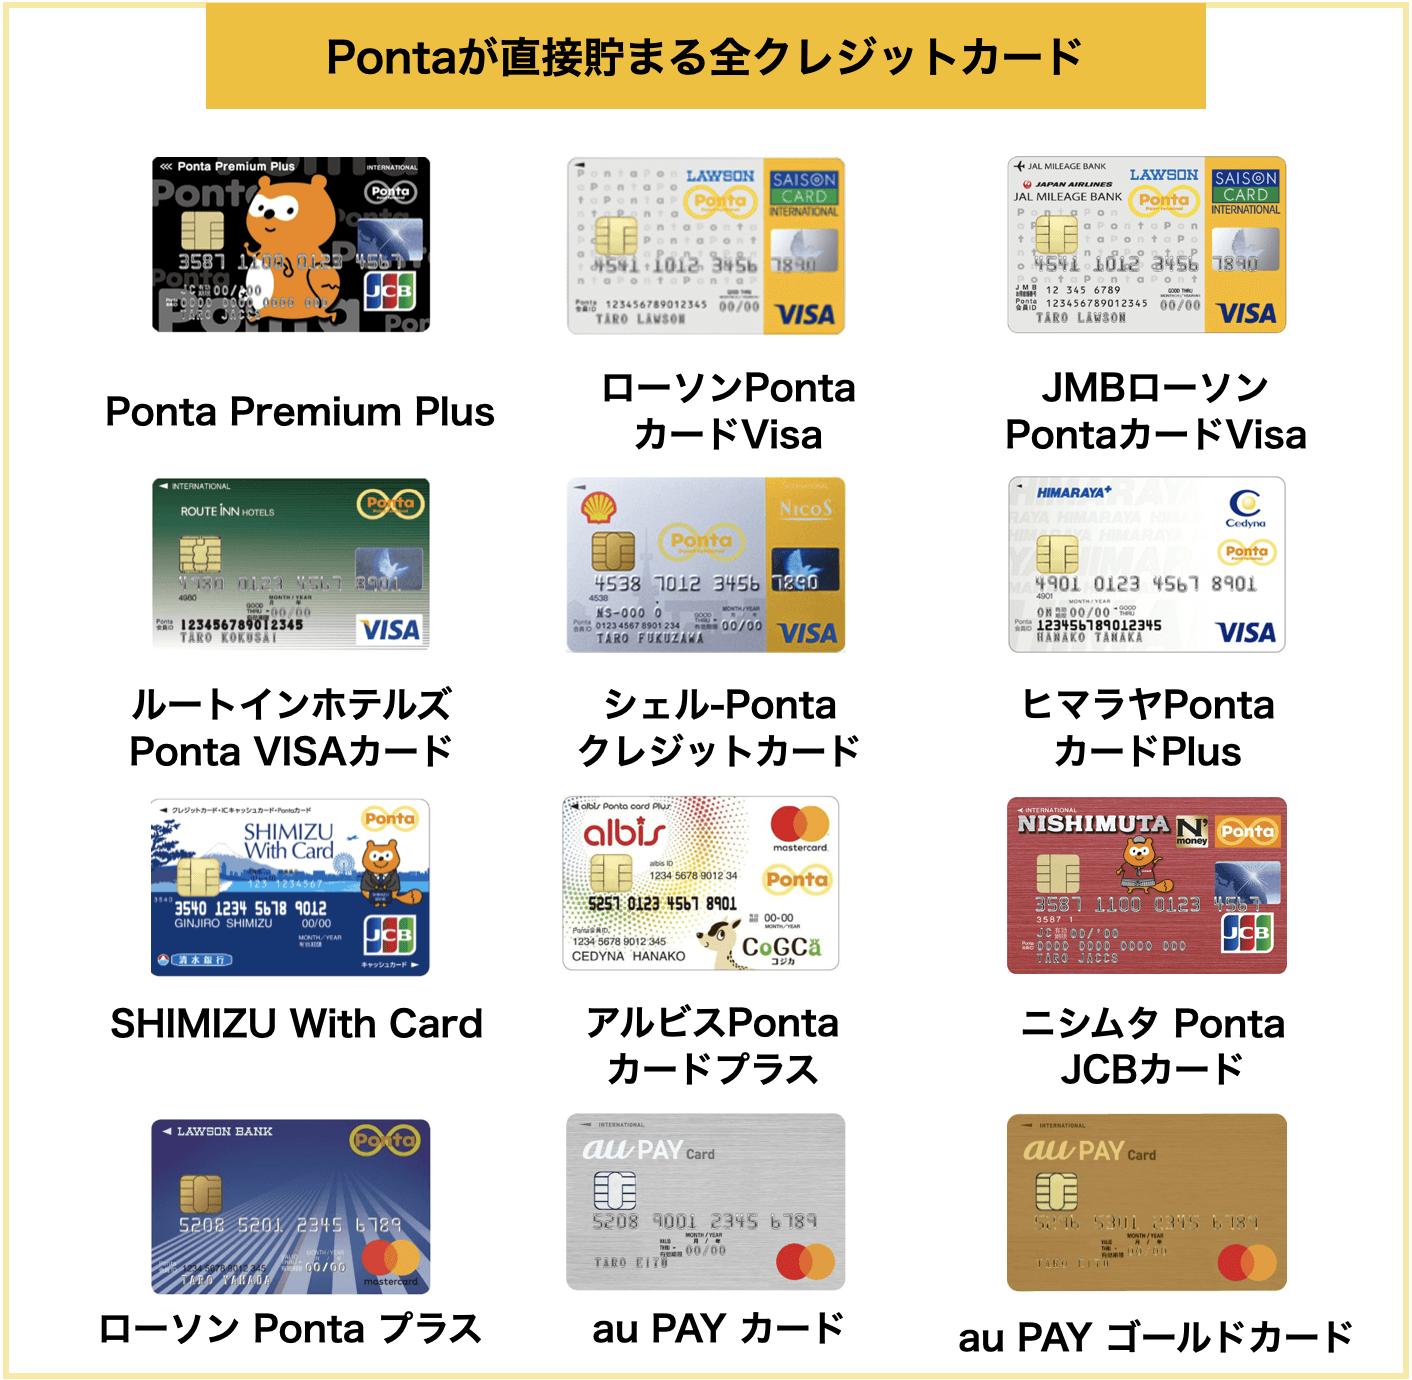 Pontaが直接貯まる全クレジットカード